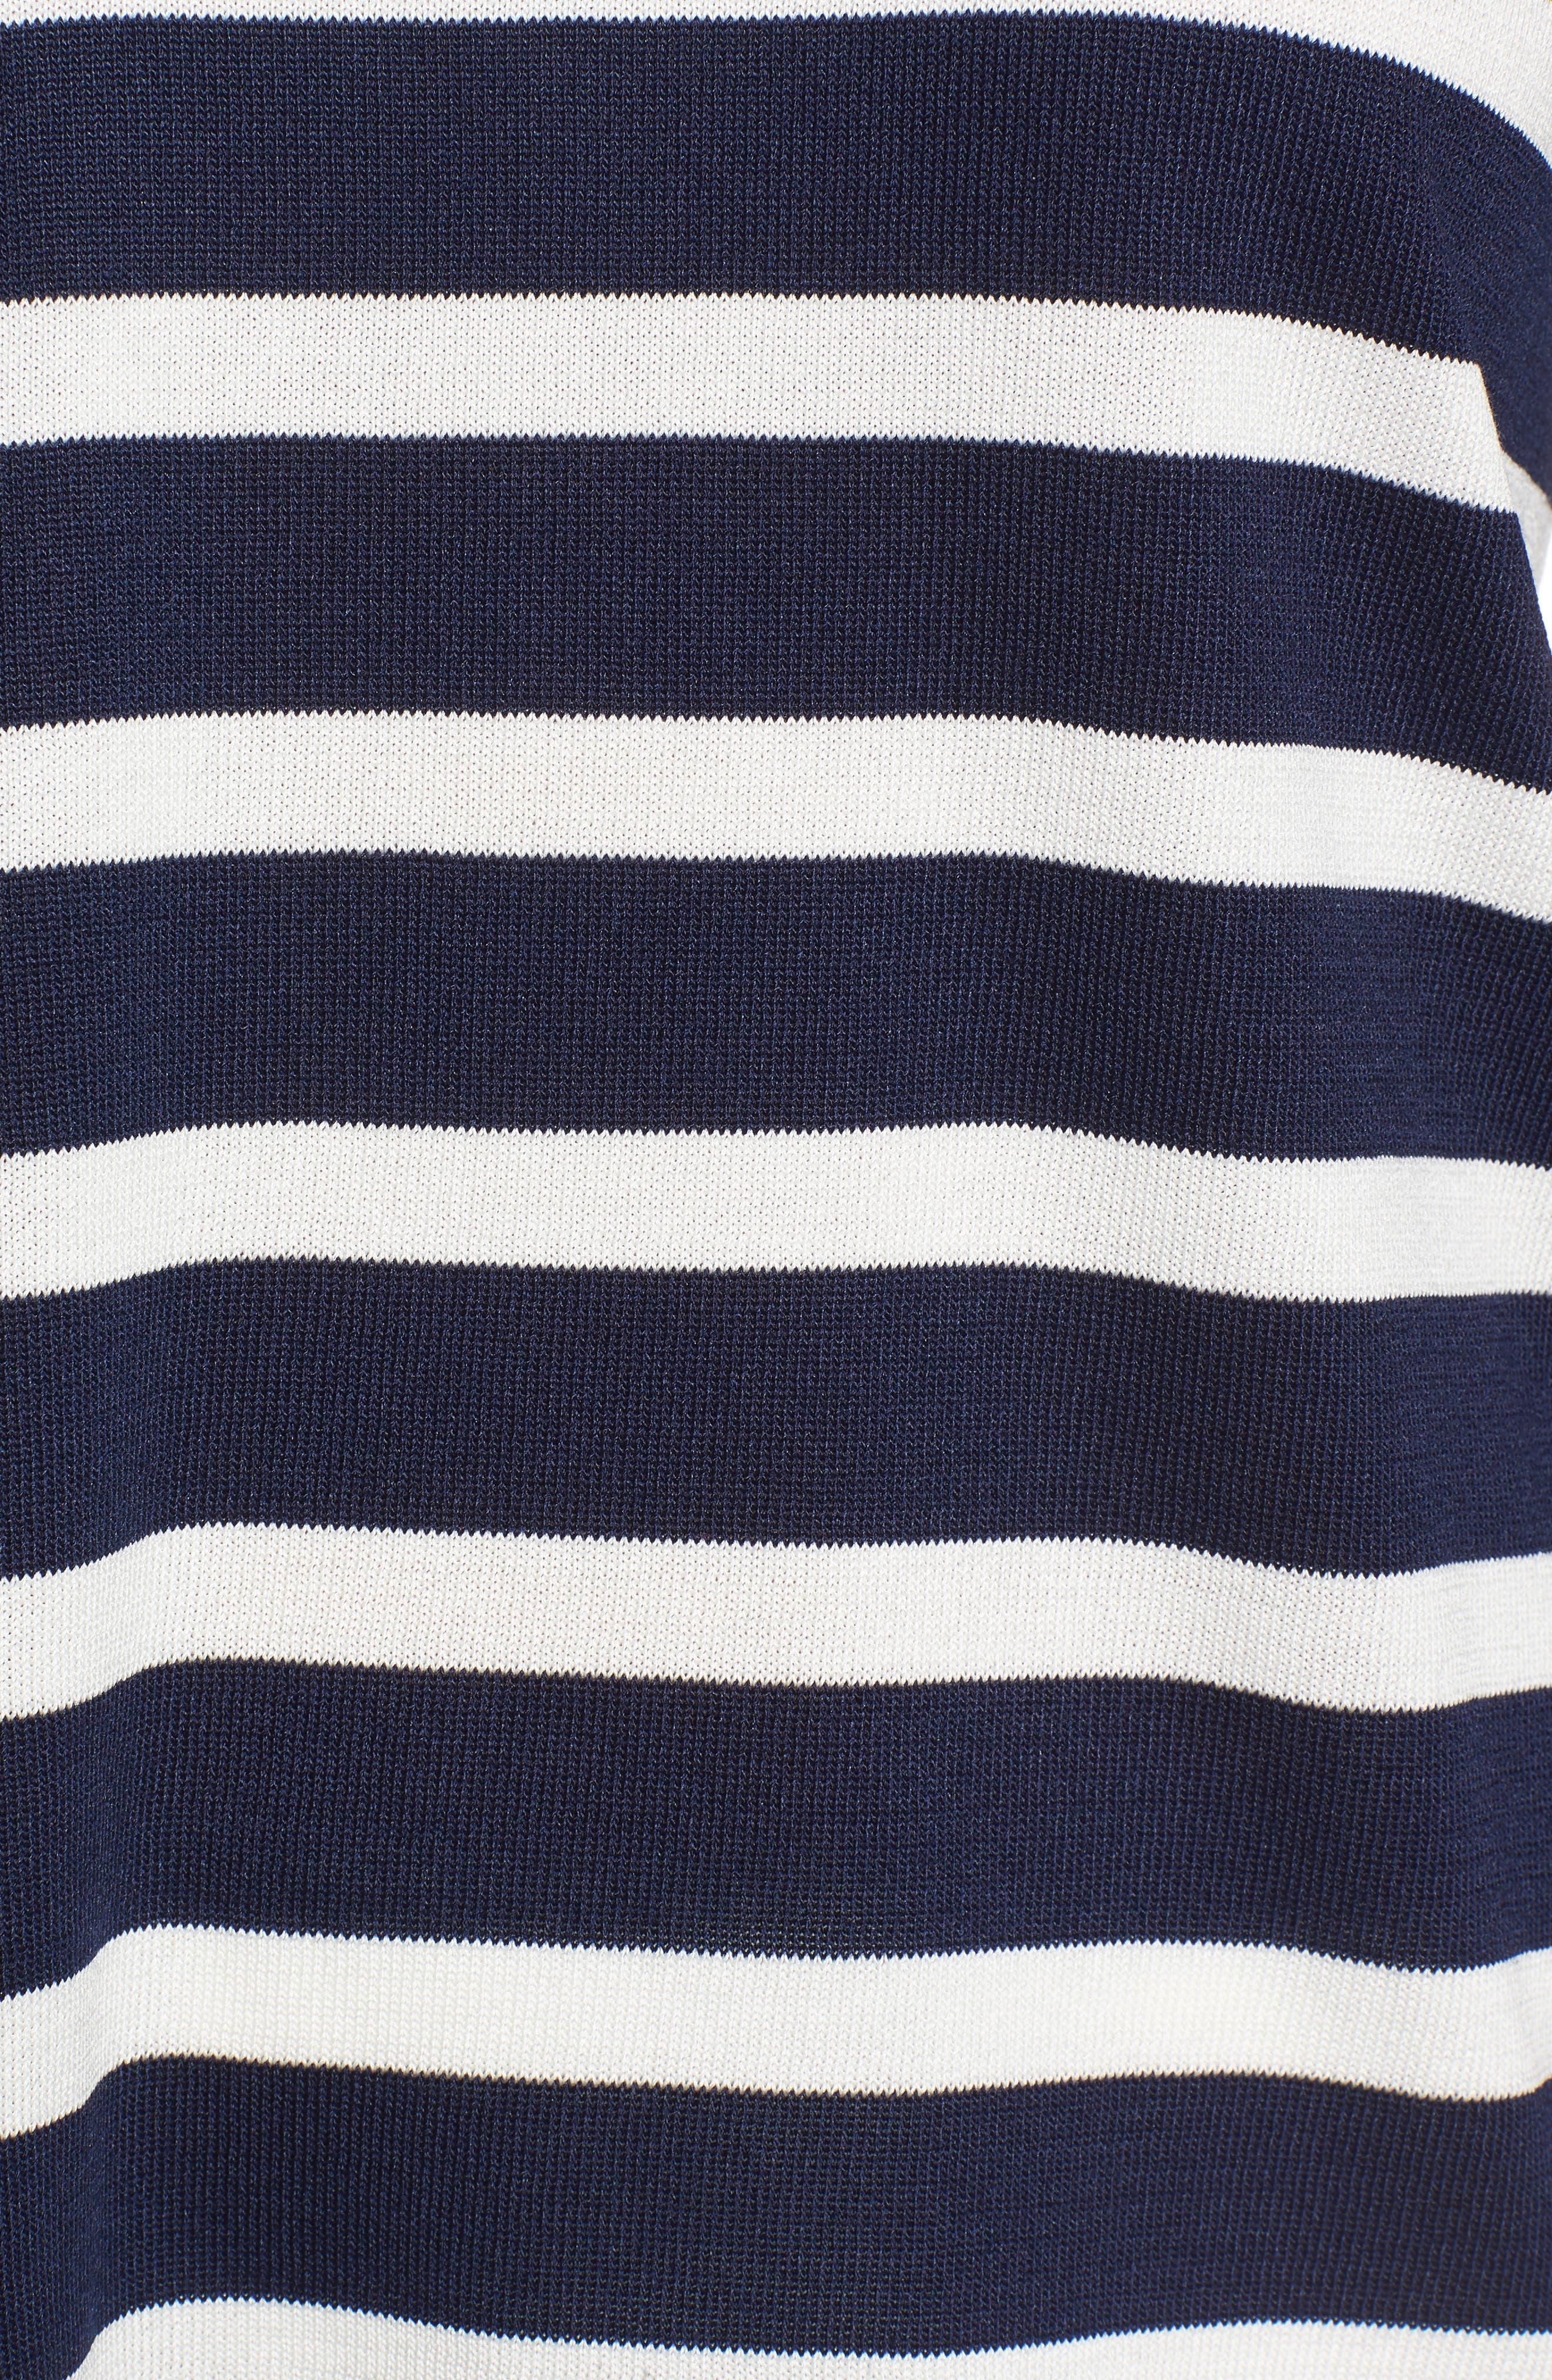 Asymmetrical Striped Sweater,                             Alternate thumbnail 11, color,